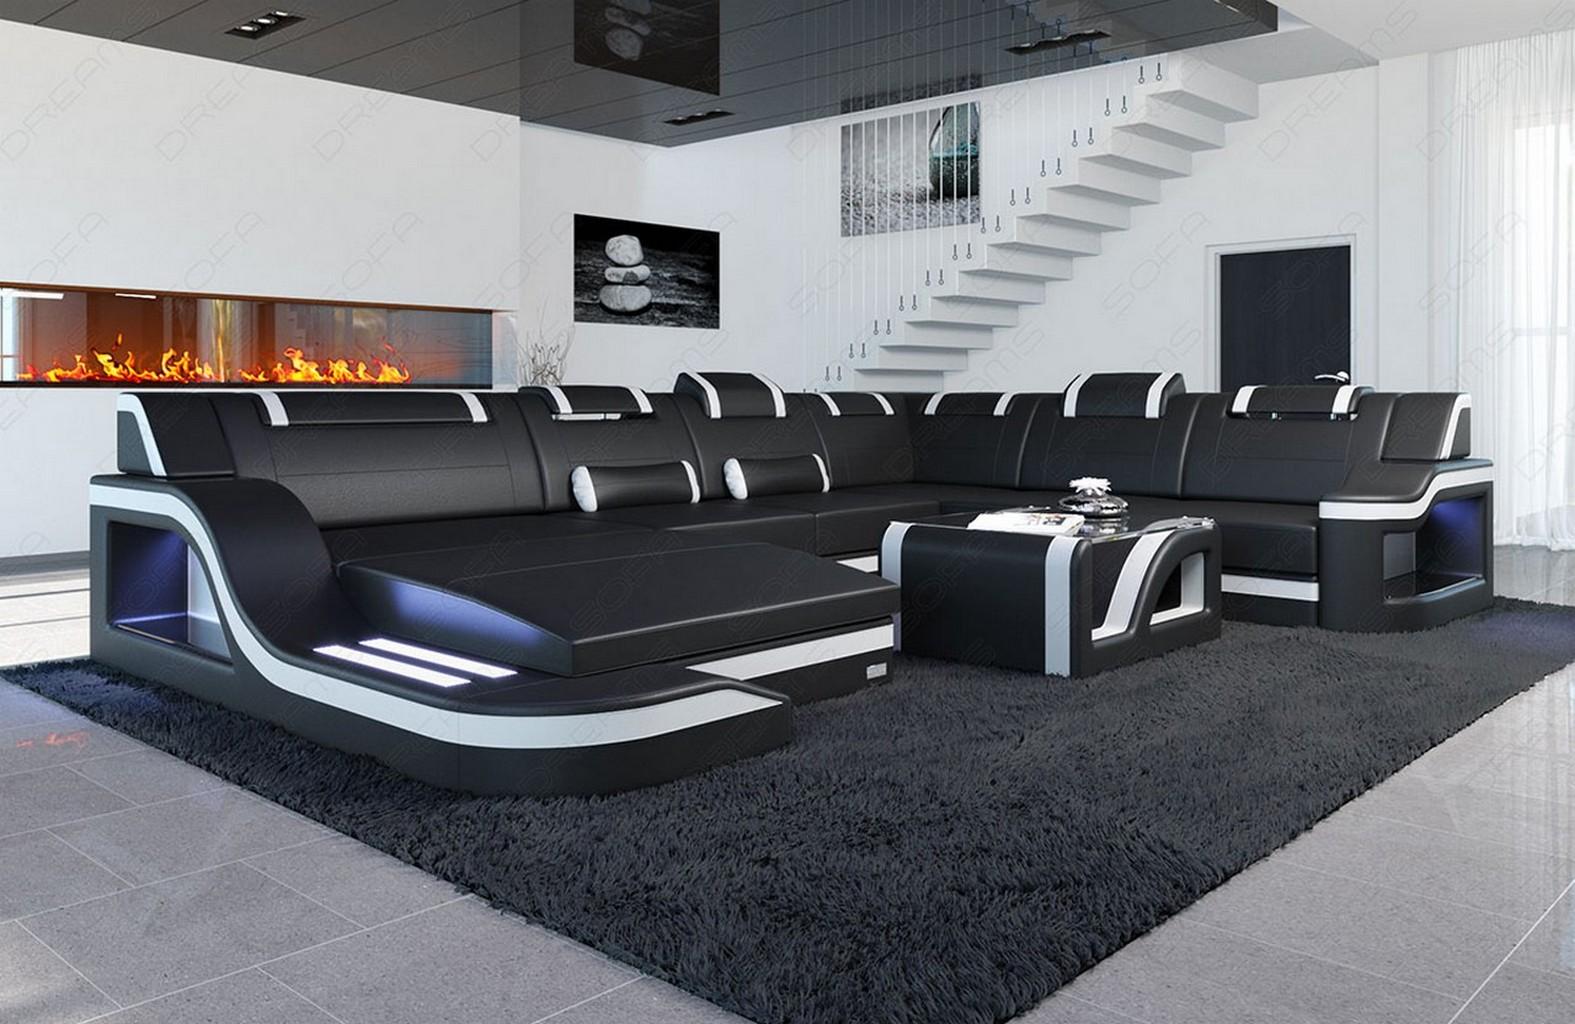 Wohnlandschaft design  Big Leather Sectional Sofa PALERMO XL Corner Sofa with LED Lights ...